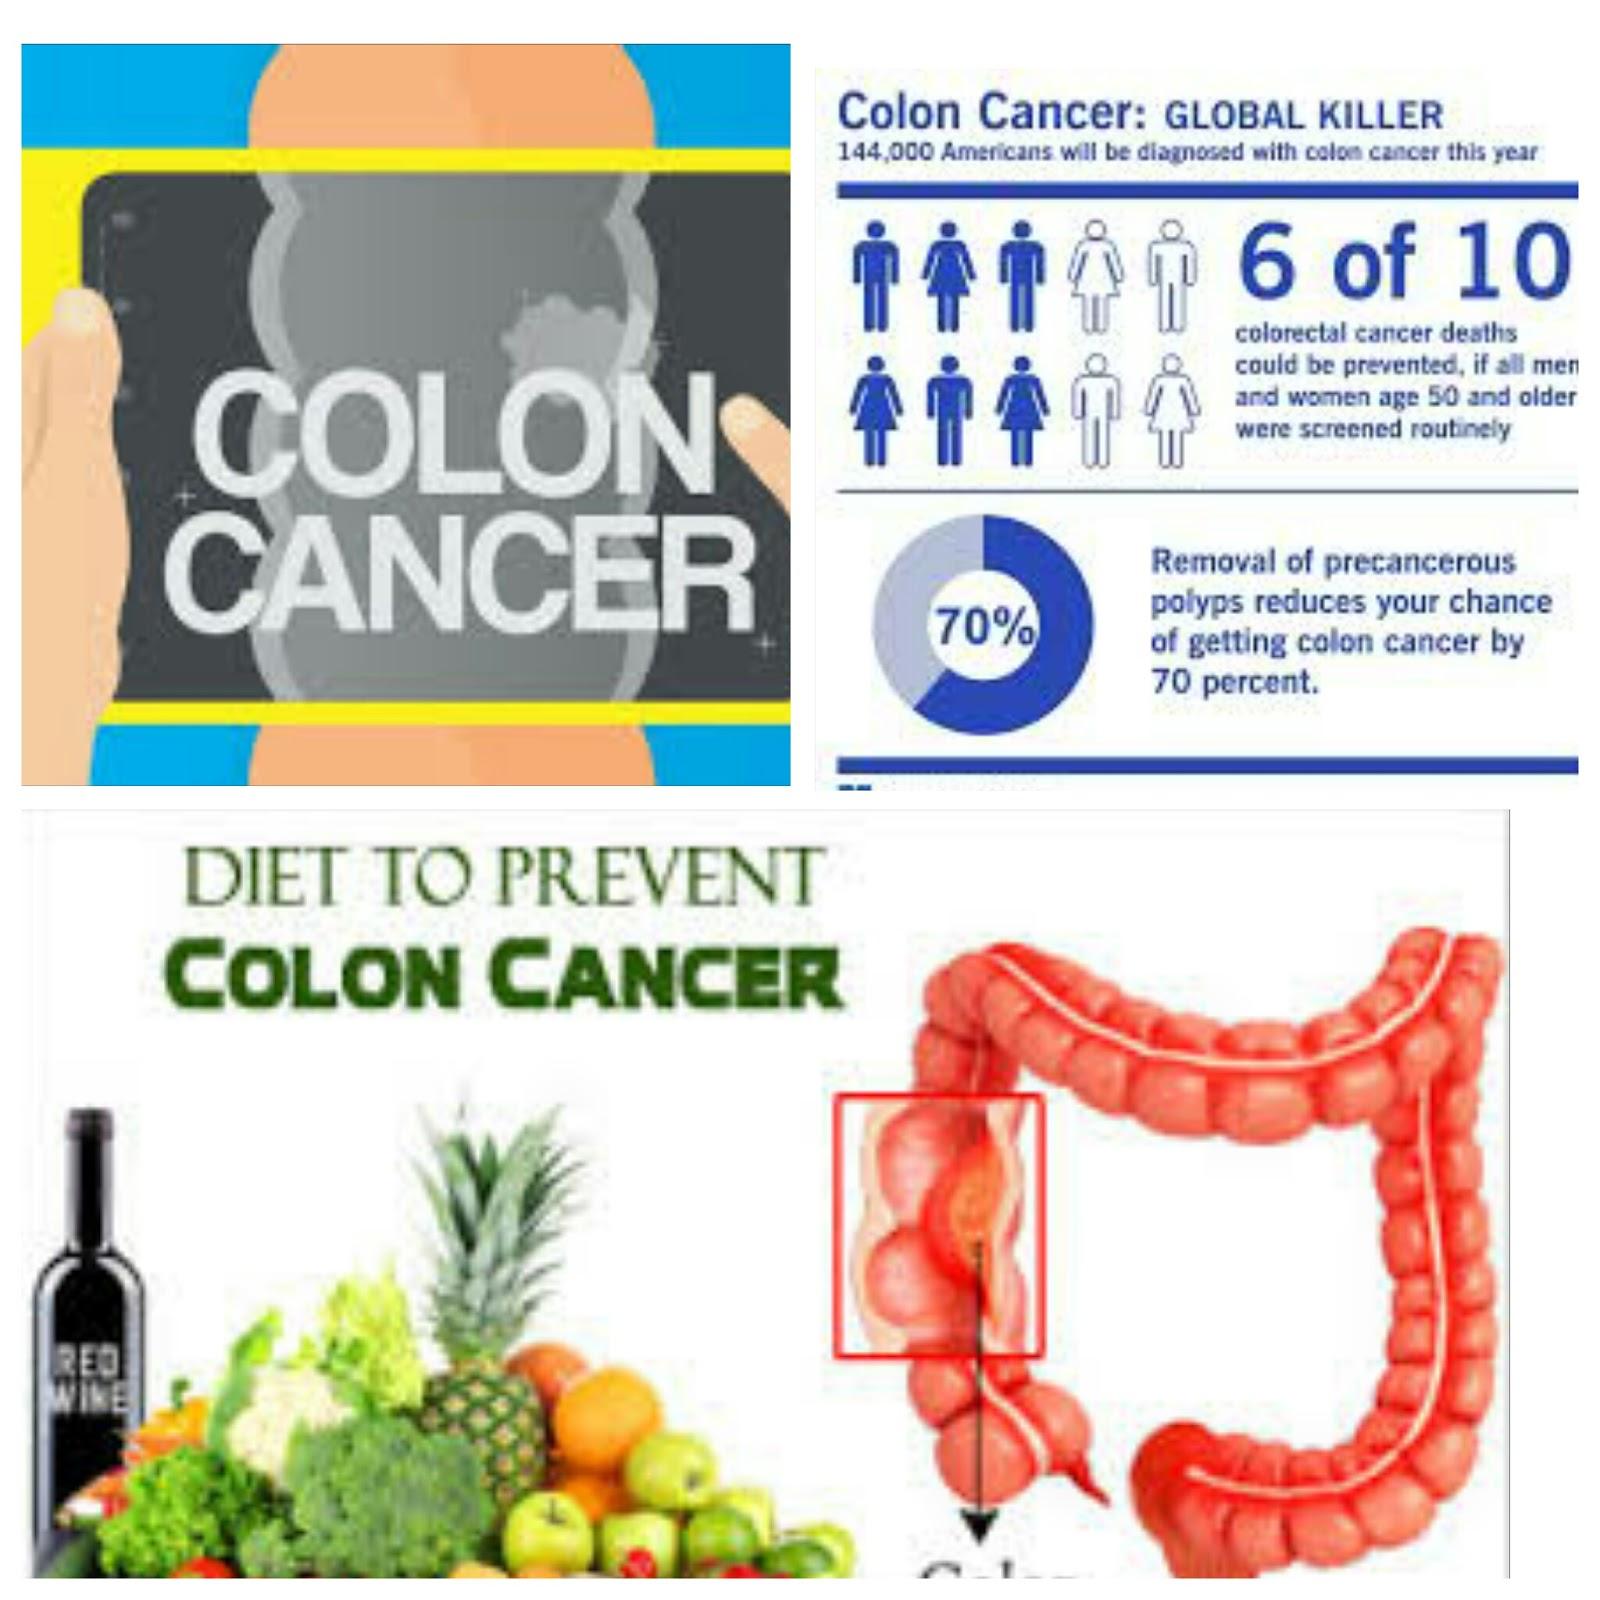 Diet to Prevent Colon Cancer